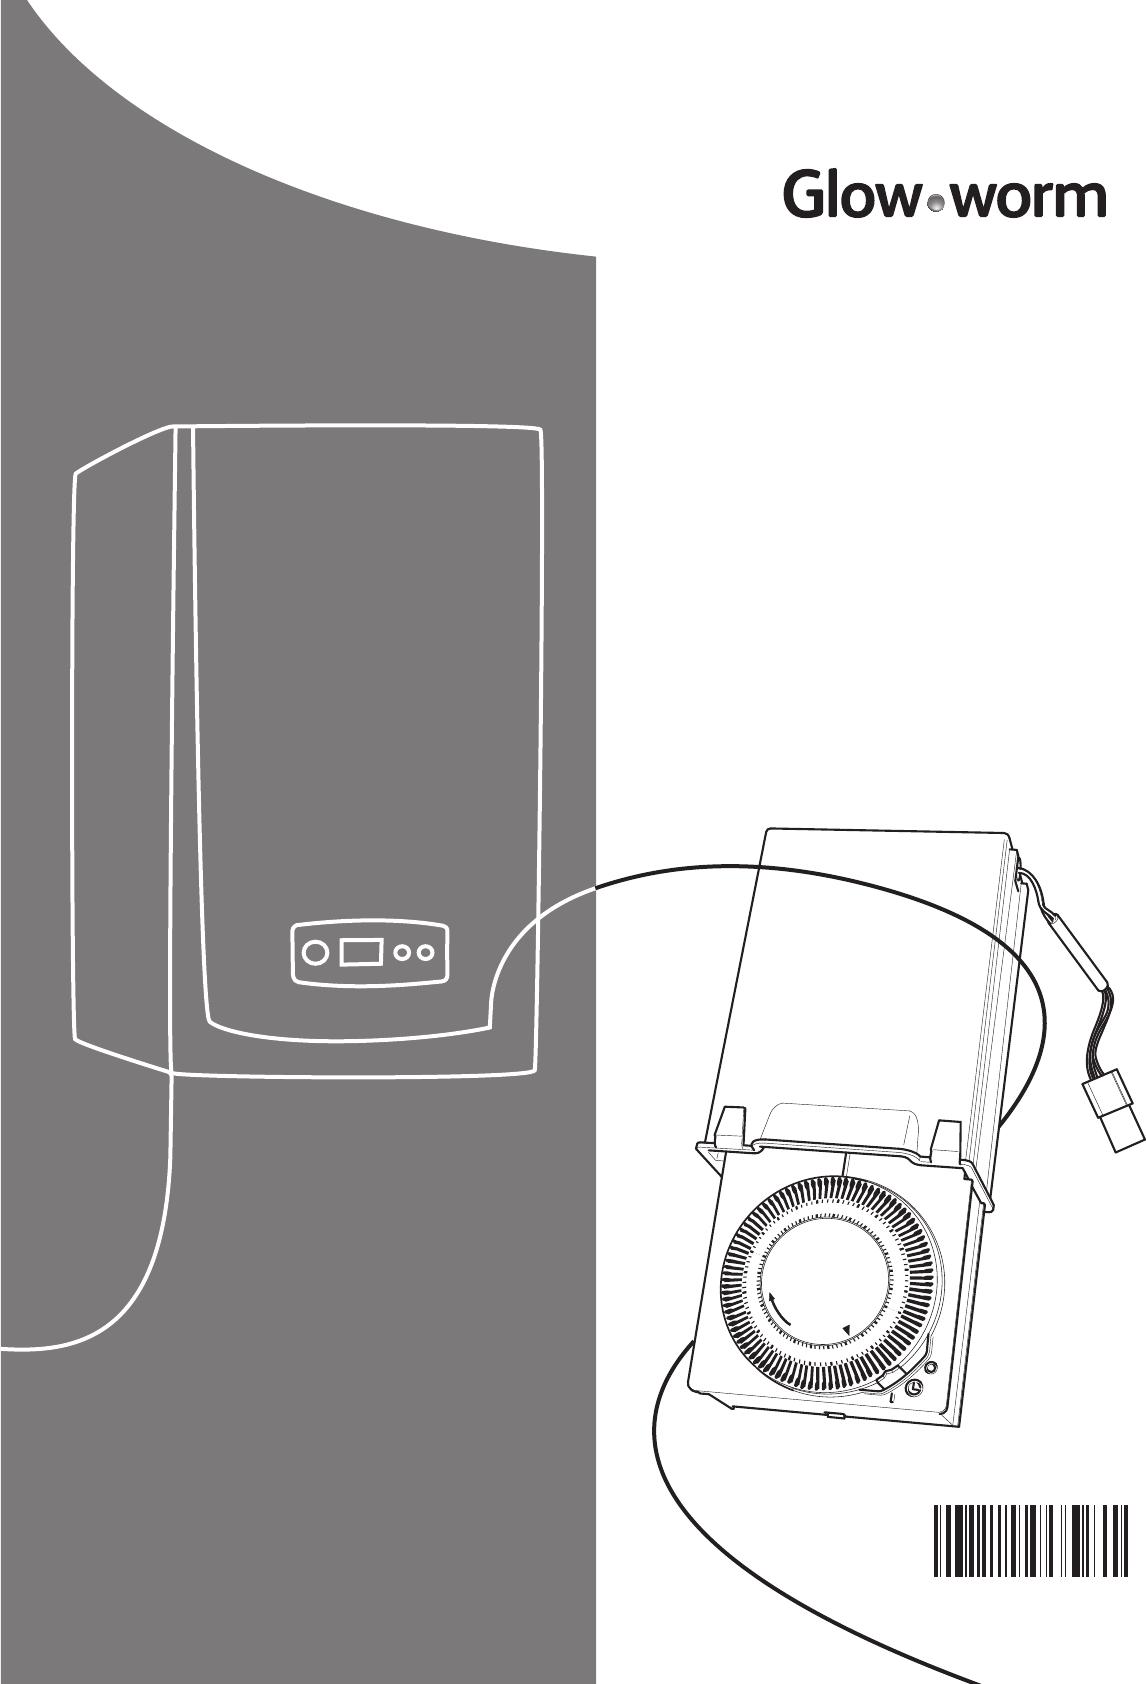 0020136593 Glowworm flexcom analog timer manual